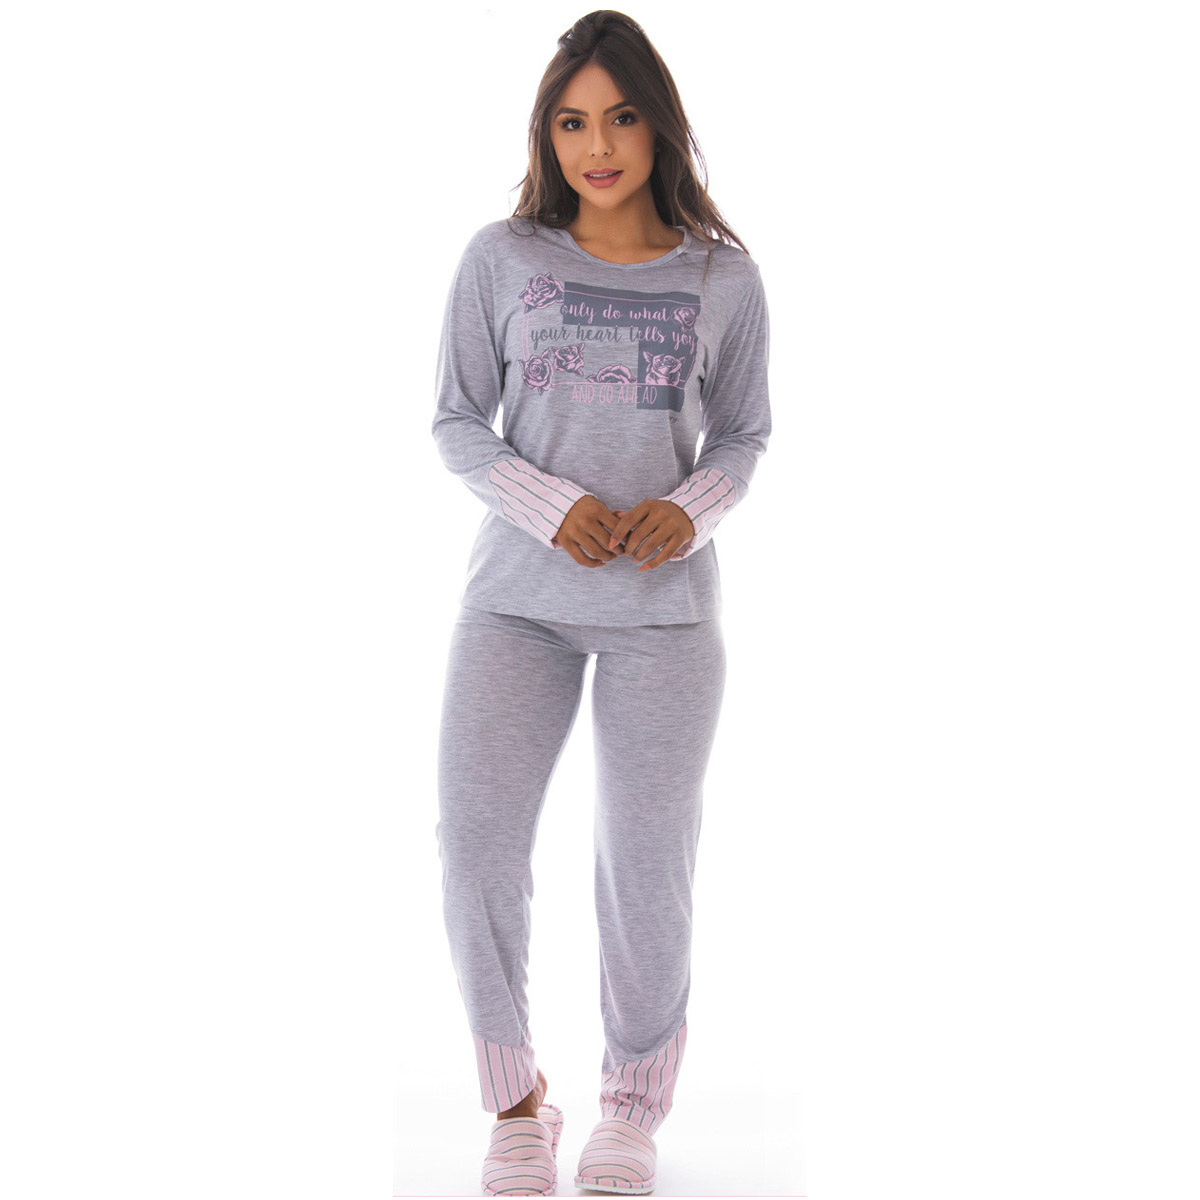 Pijama feminino de inverno COMPOSÊ Victory